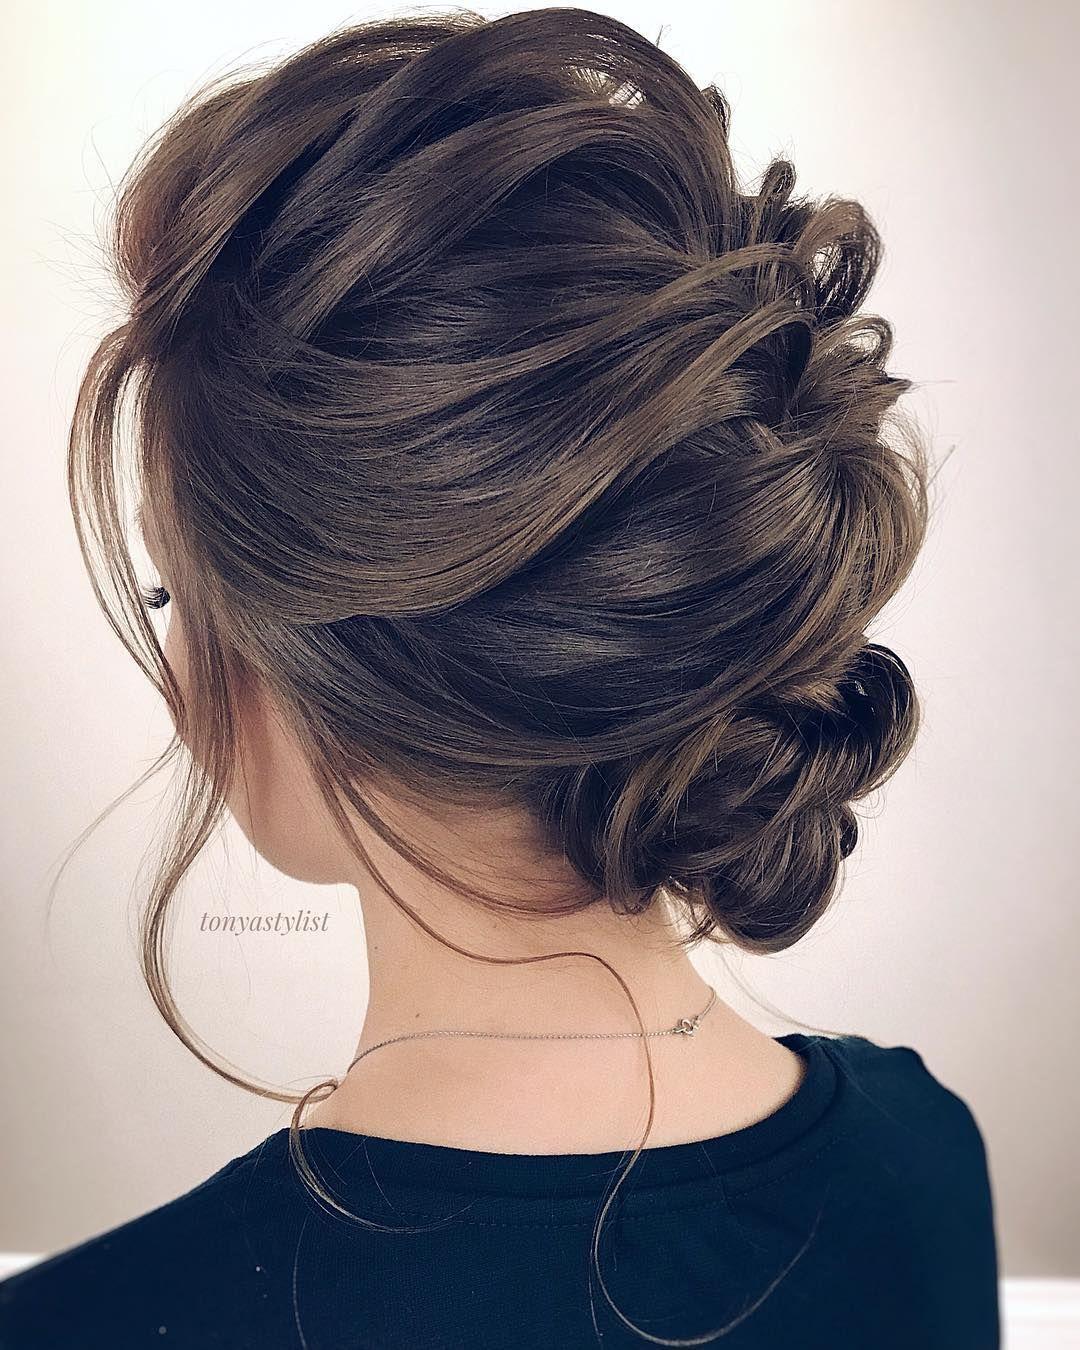 19 Extraordinary Hairstyles For Medium Length Hair Ideas Medium Length Hair Styles Updos For Medium Length Hair Hair Styles